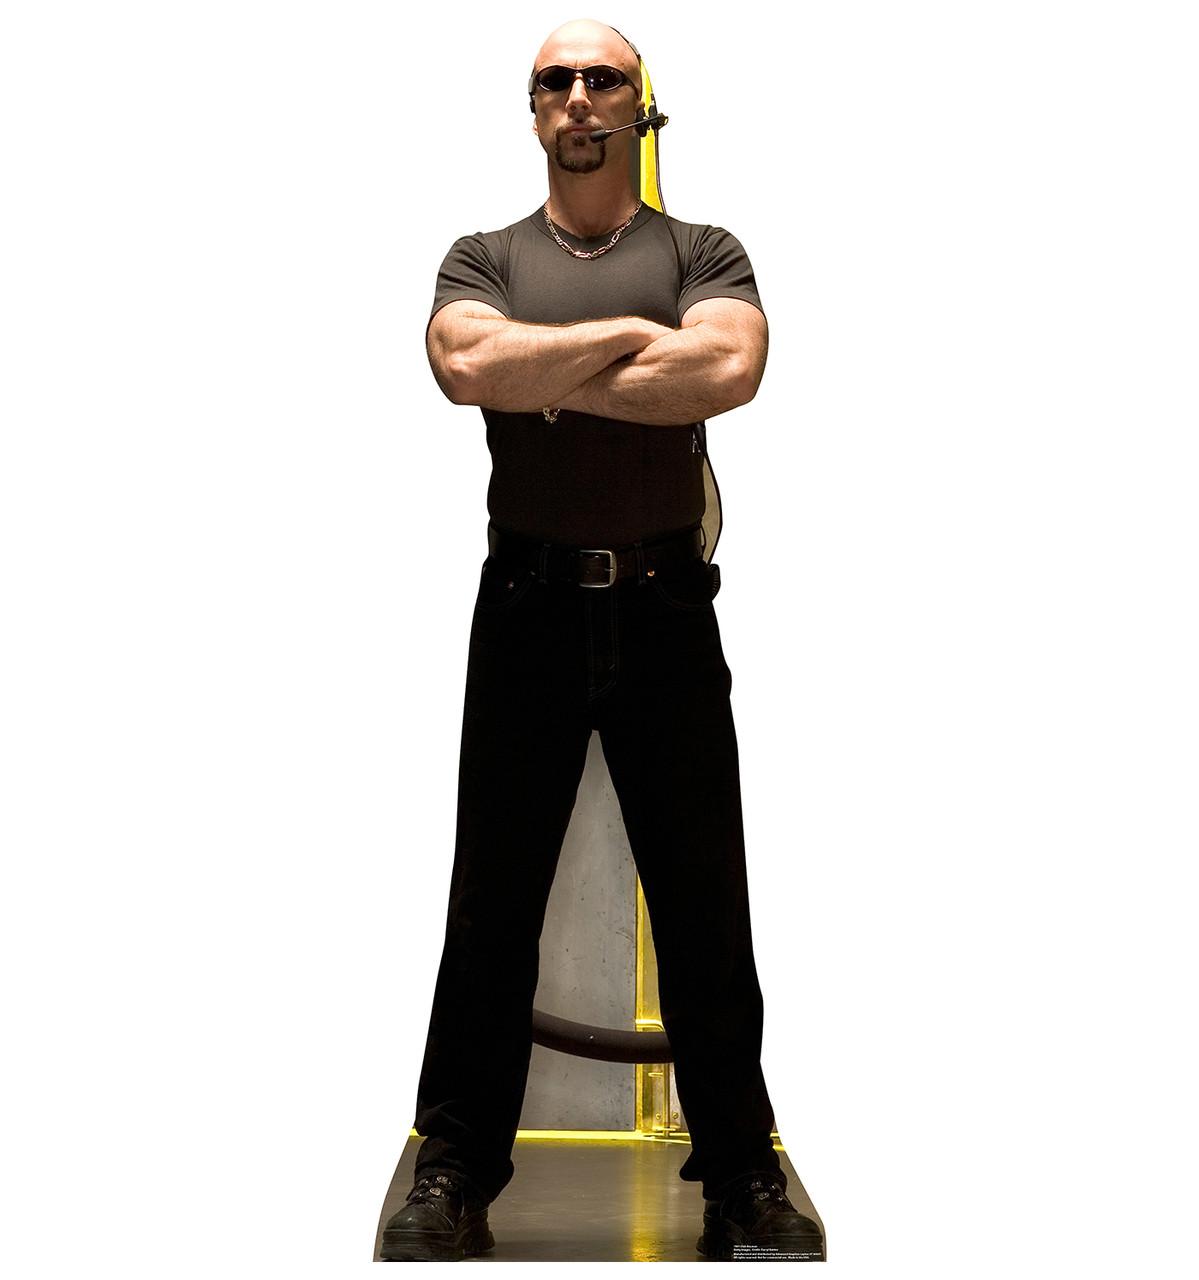 Life-size Club Bouncer Cardboard Standup